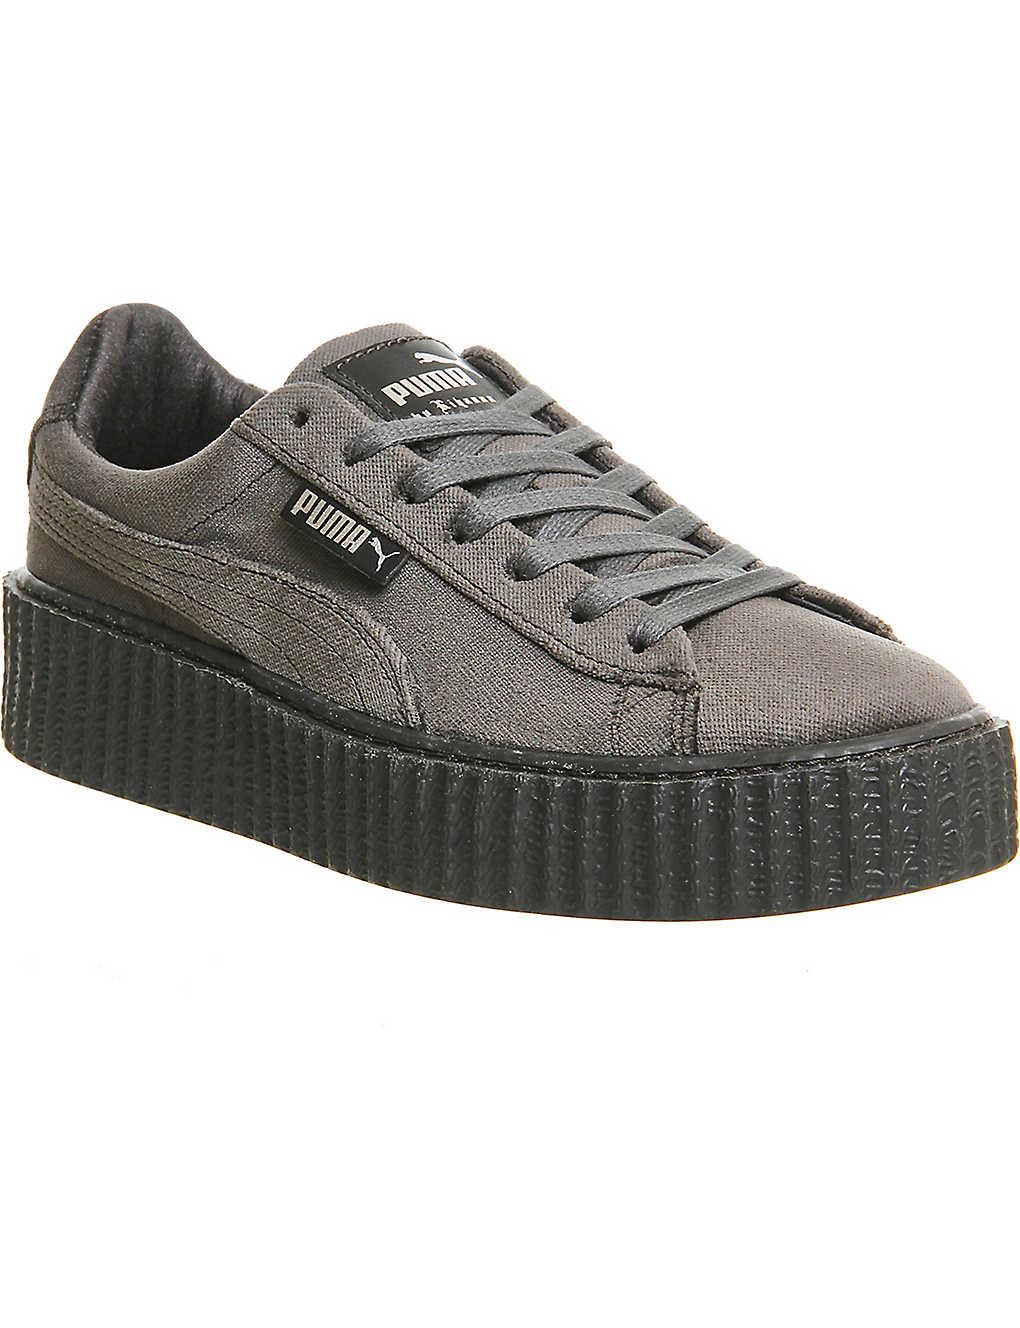 best sneakers f6b4c 7500e PUMA - Fenty x PUMA velvet creepers | Selfridges.com